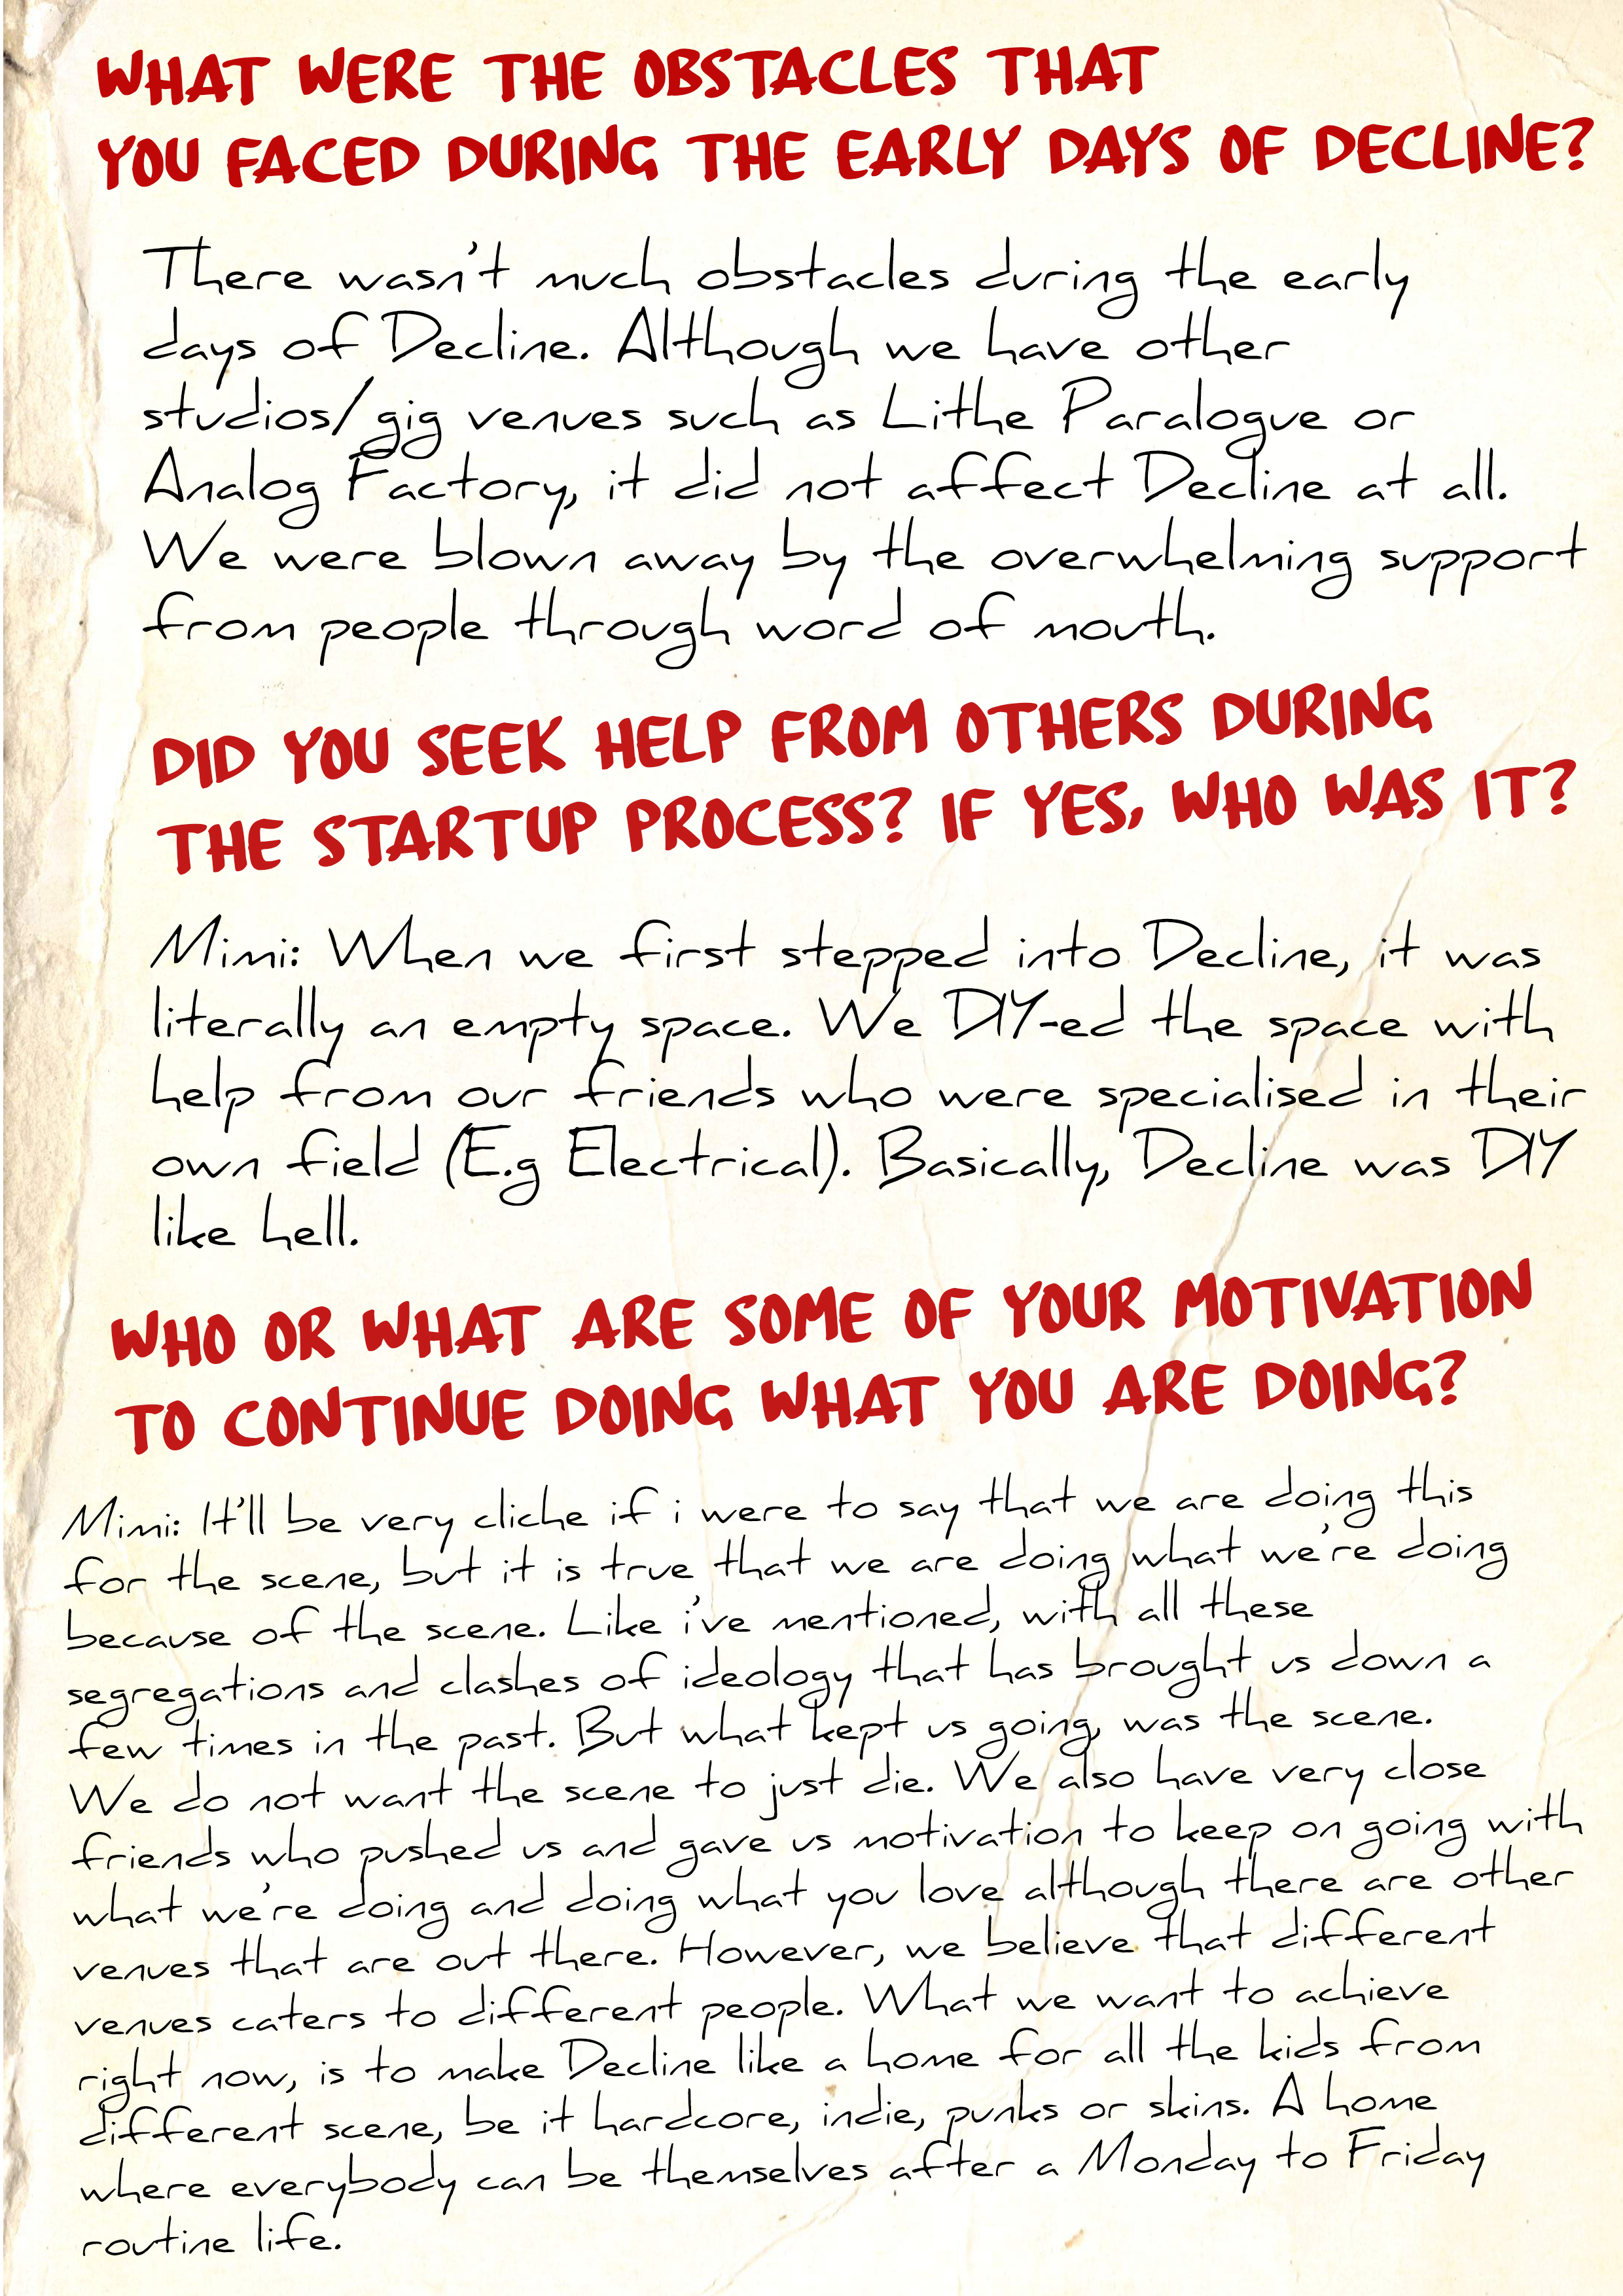 YIB PAGE 26